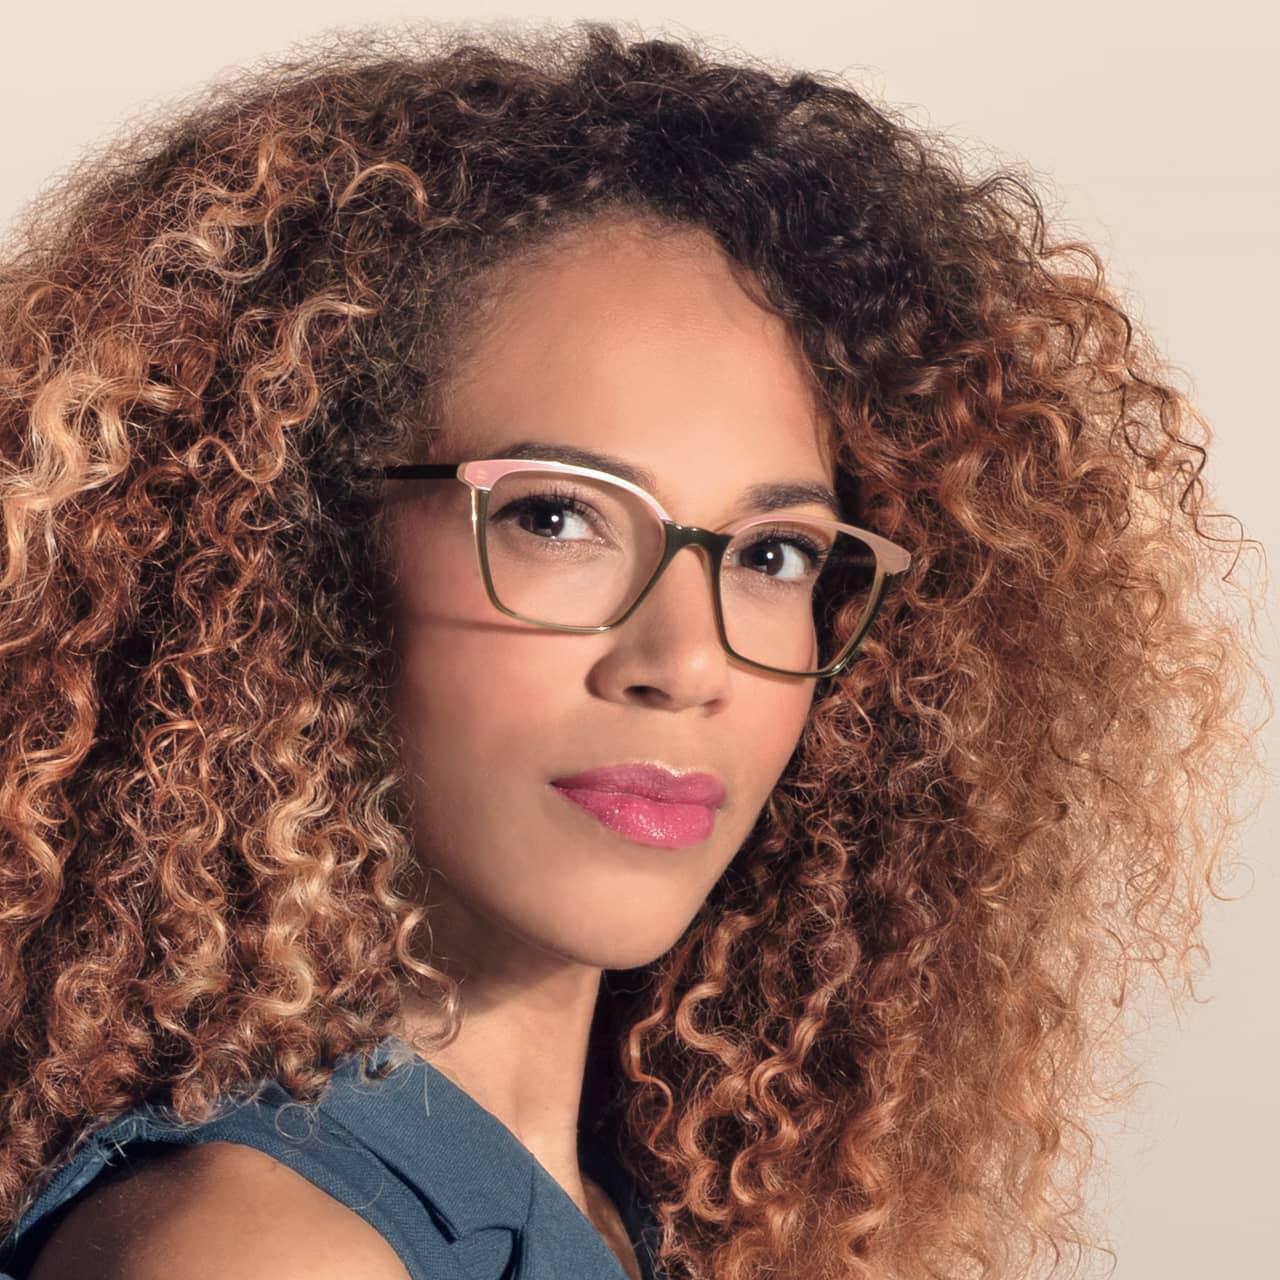 lafont black woman eyeglasses feb 18 2021